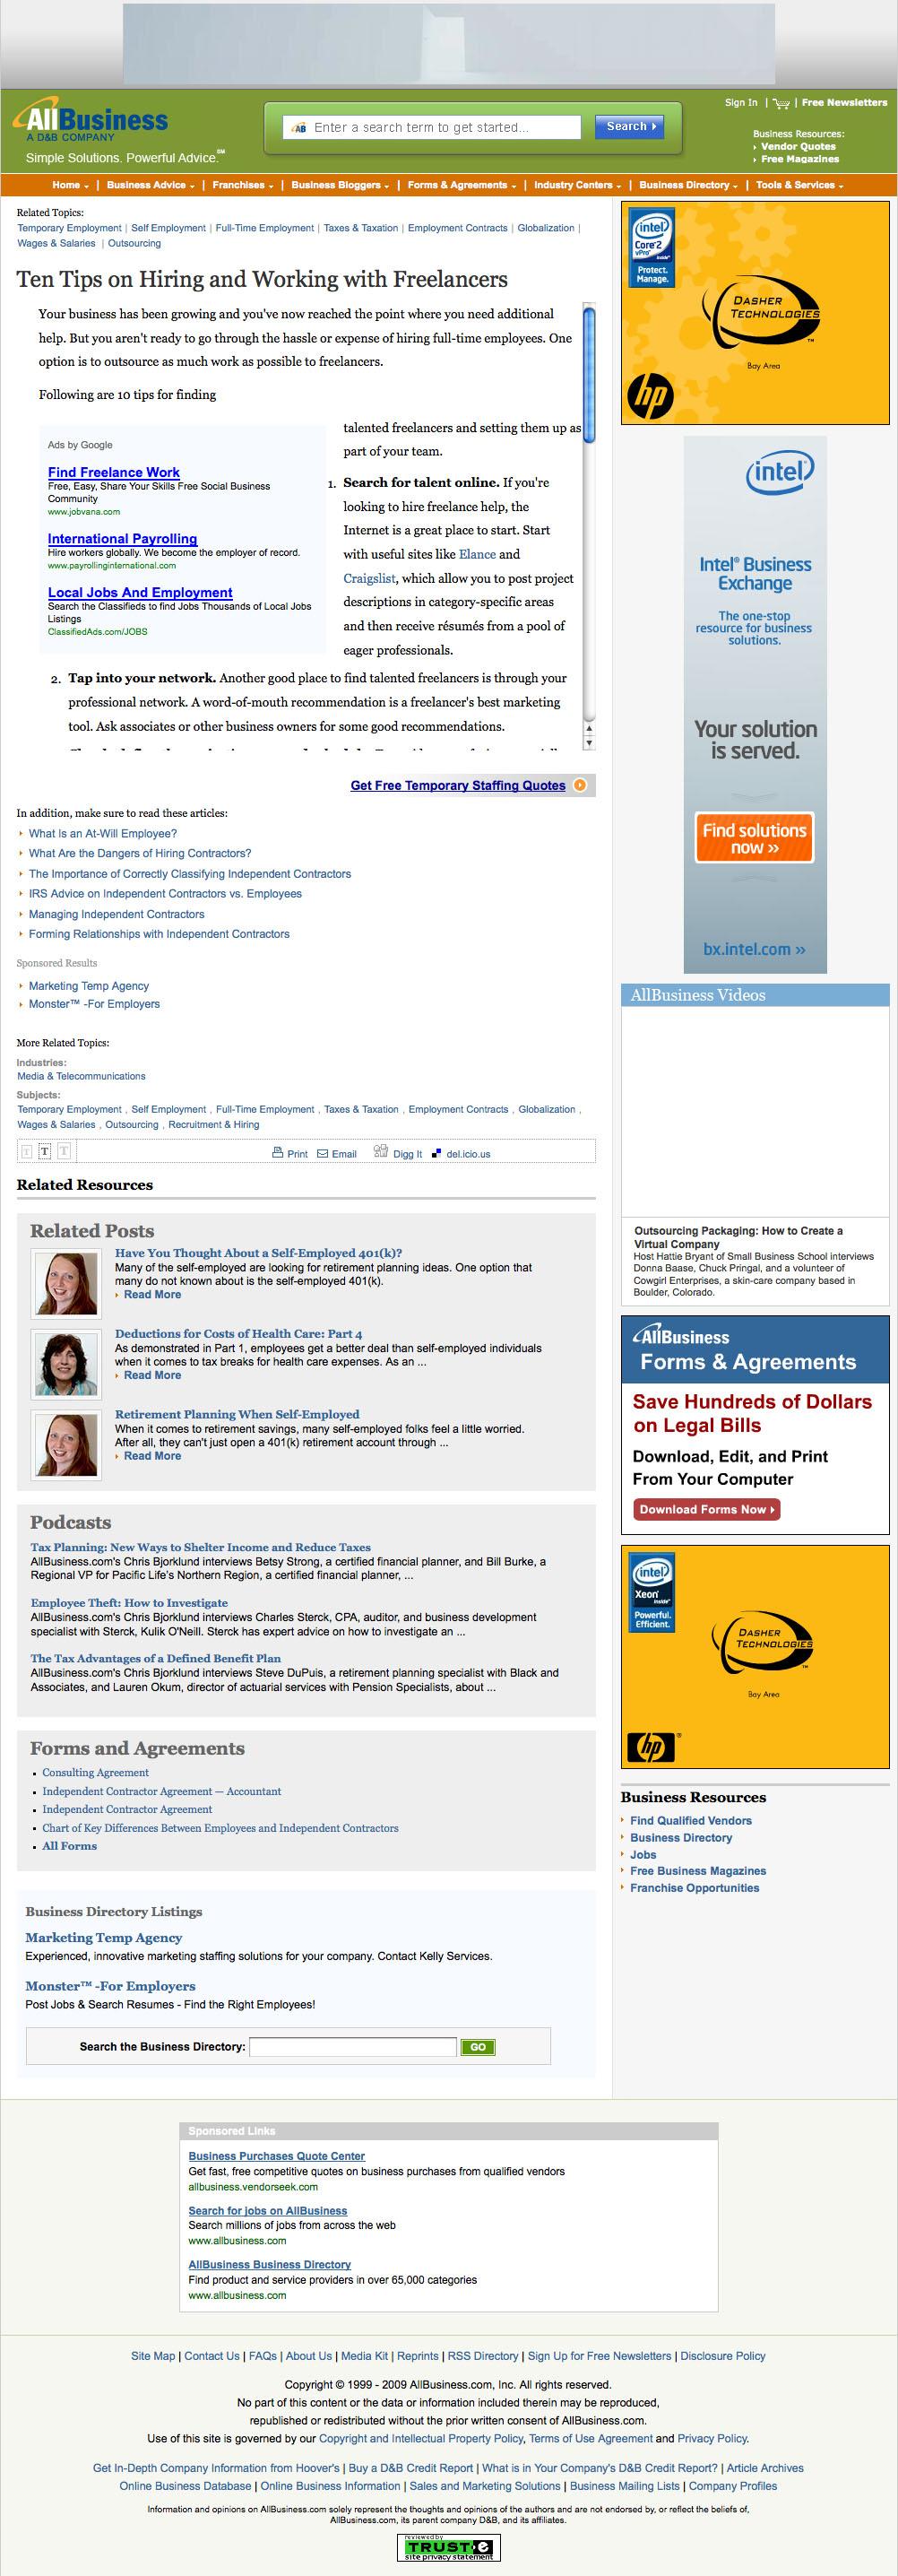 Eric Pedersen: AllBusiness Article Page